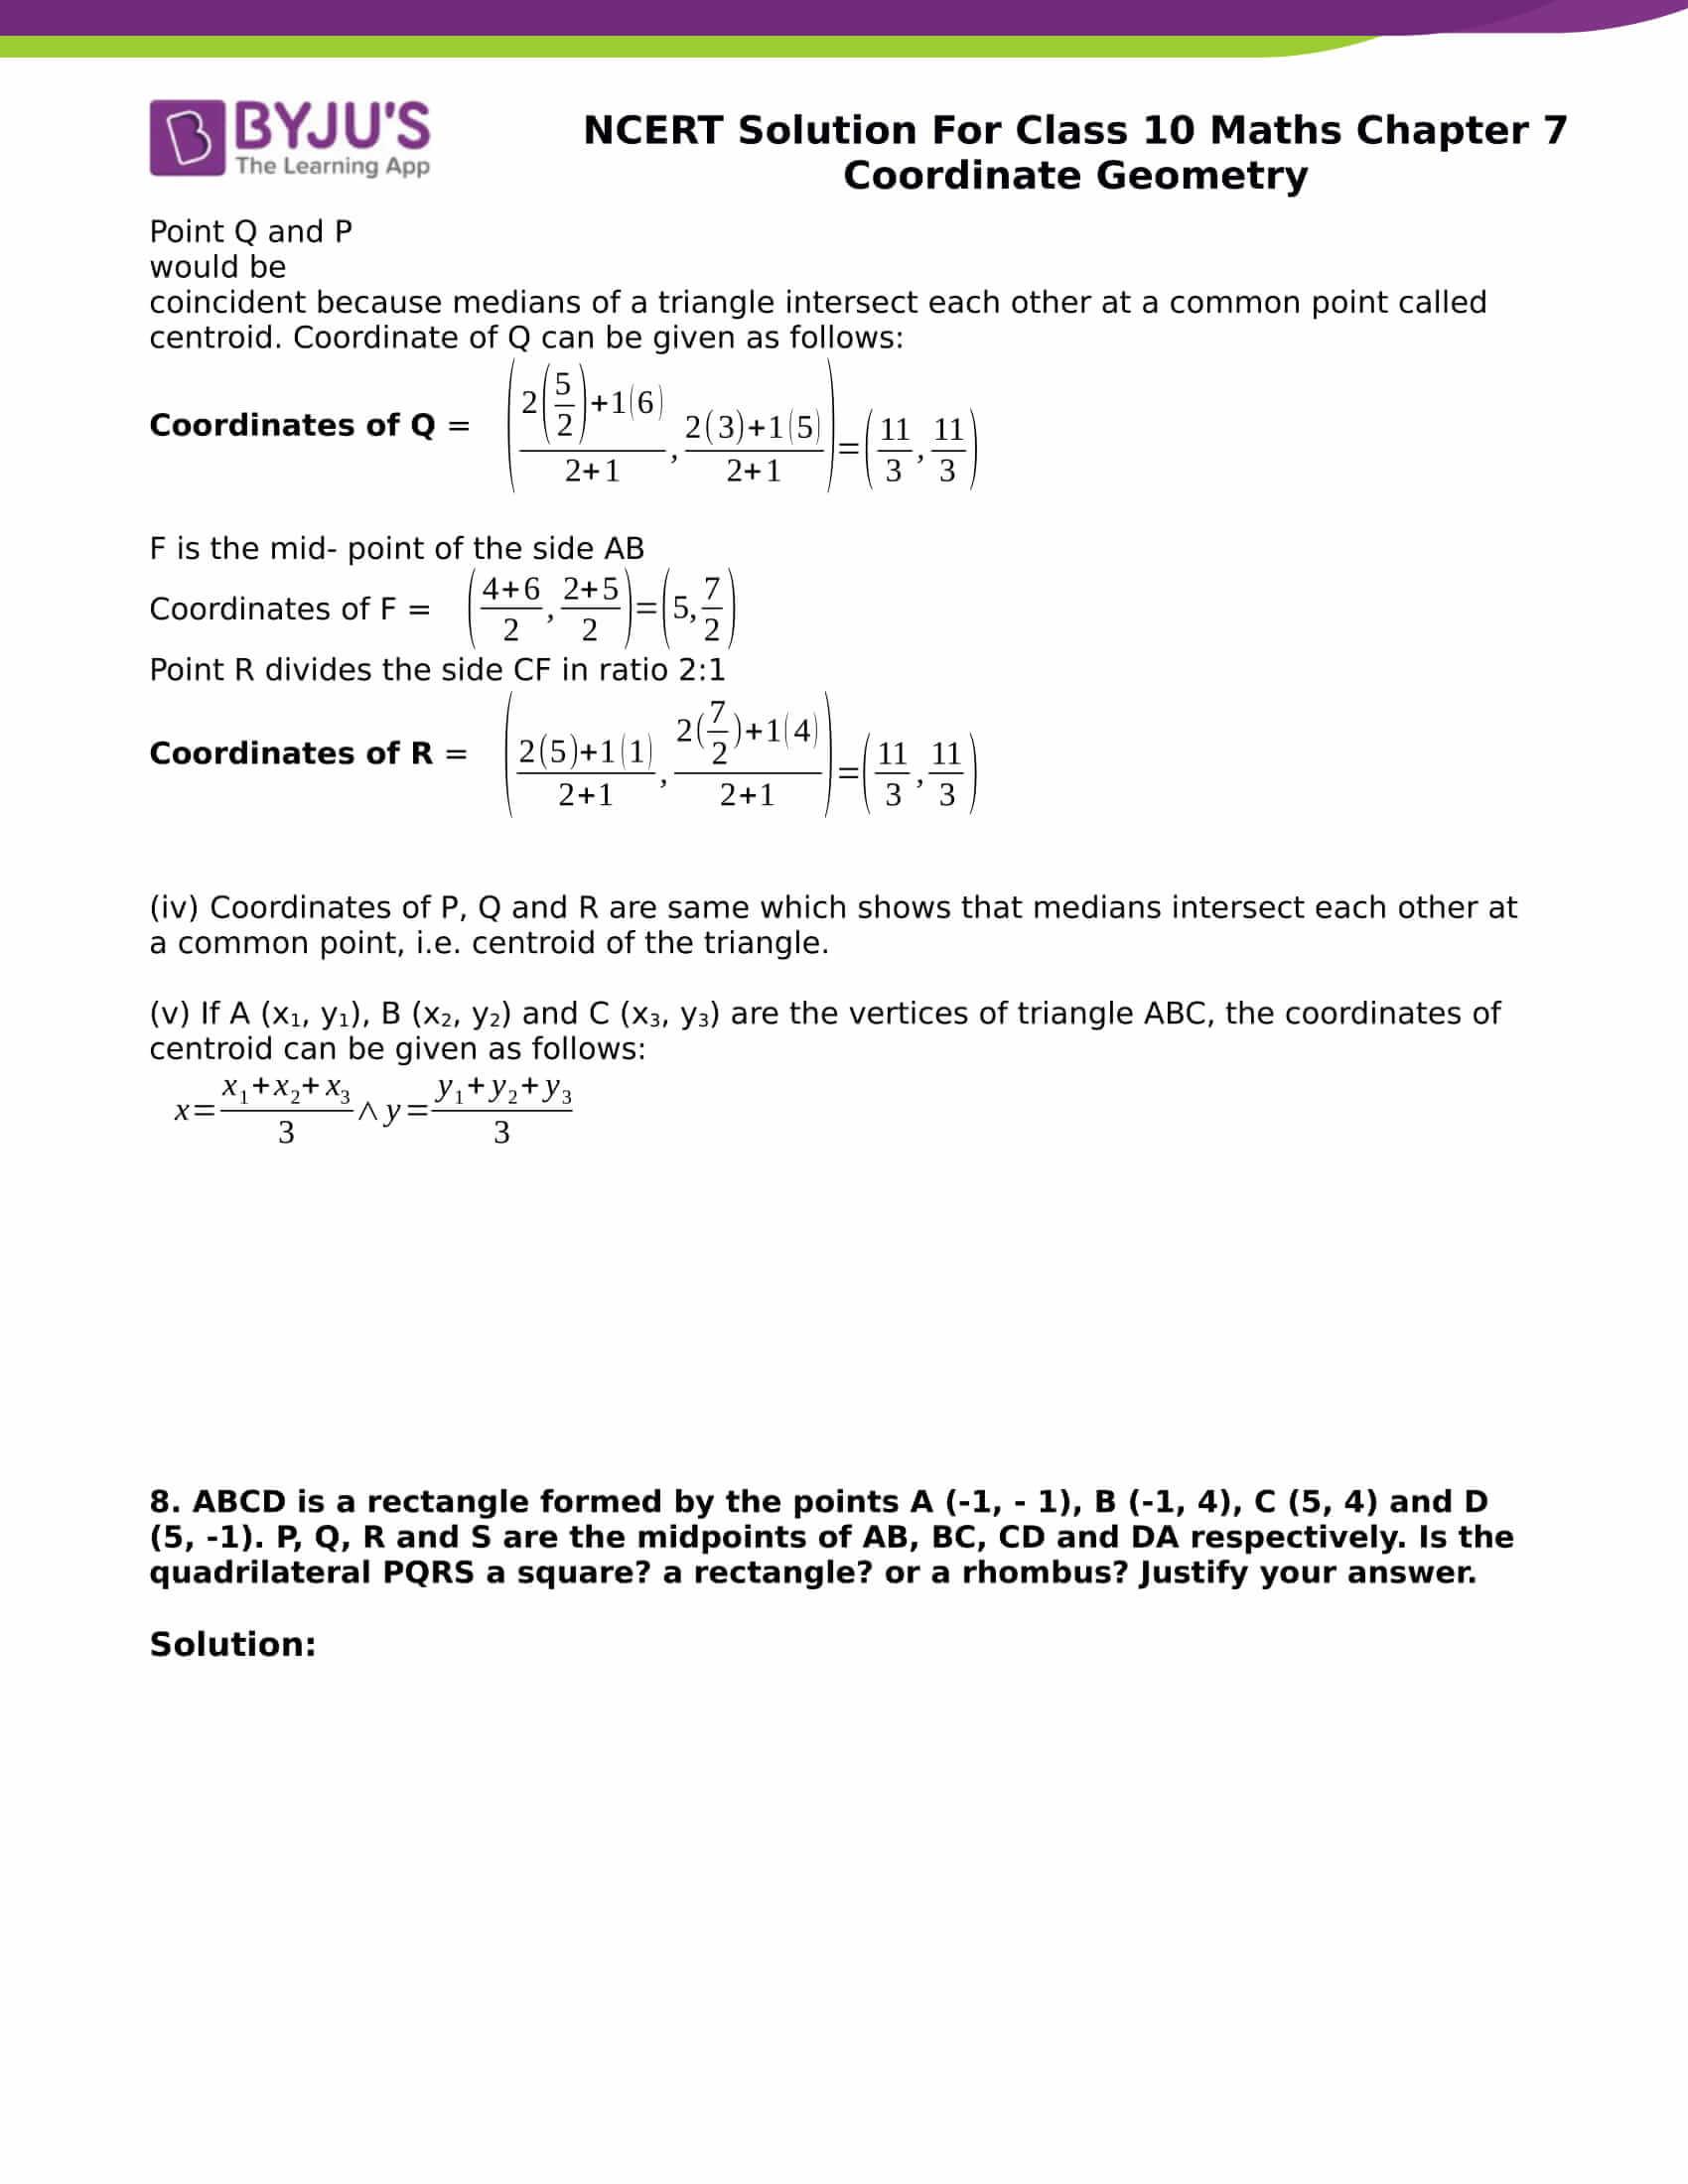 NCERT Solution for class 10 Maths chapter 7 Coordinate Geometry Part 30